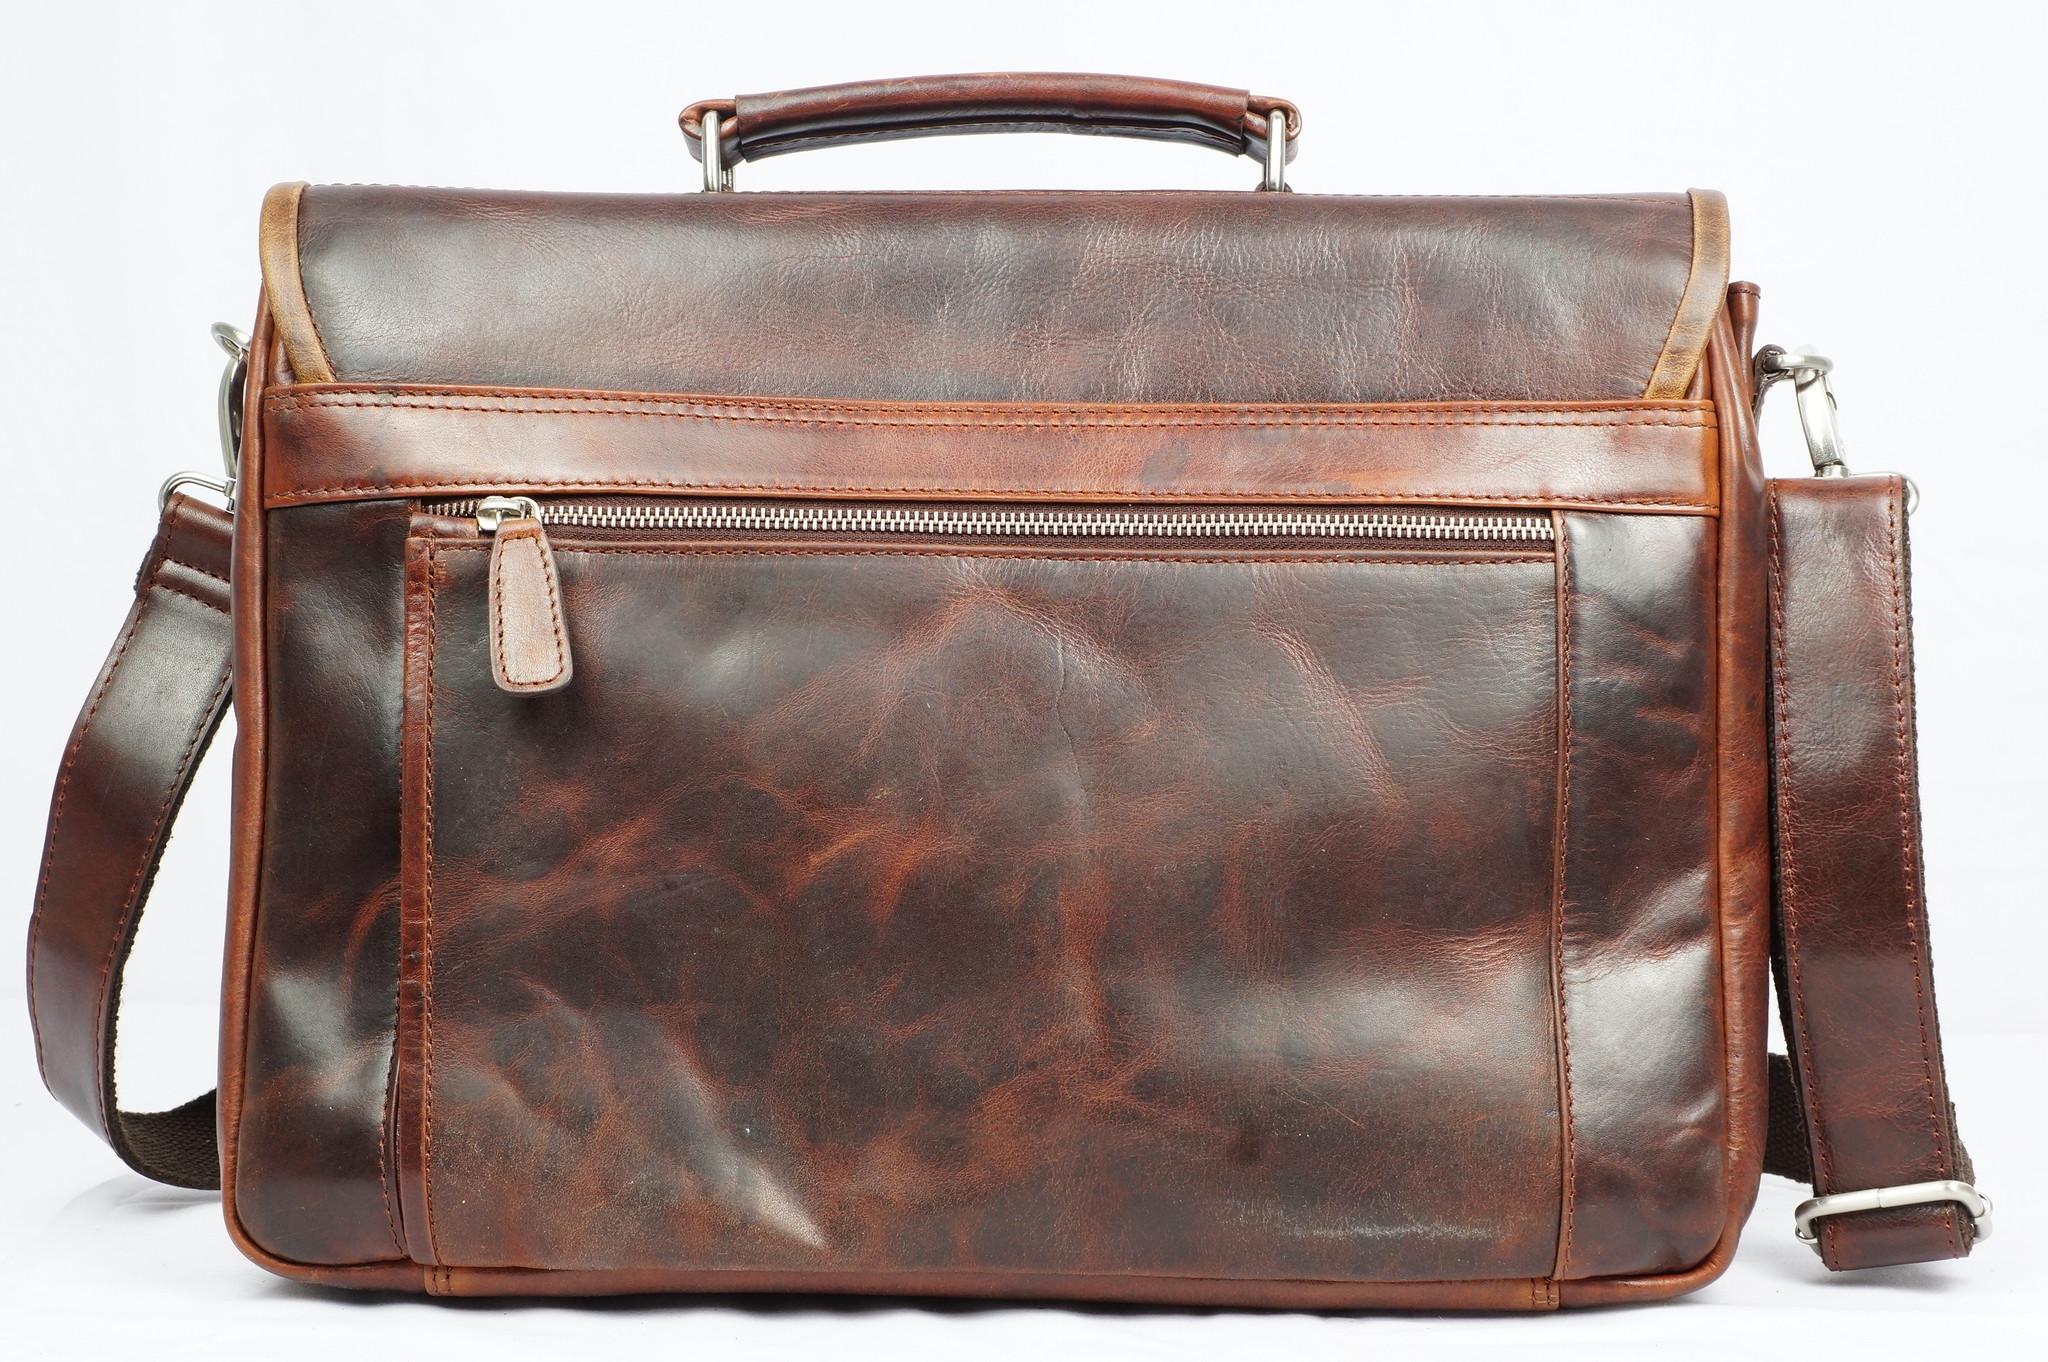 Arpello Old School business bag